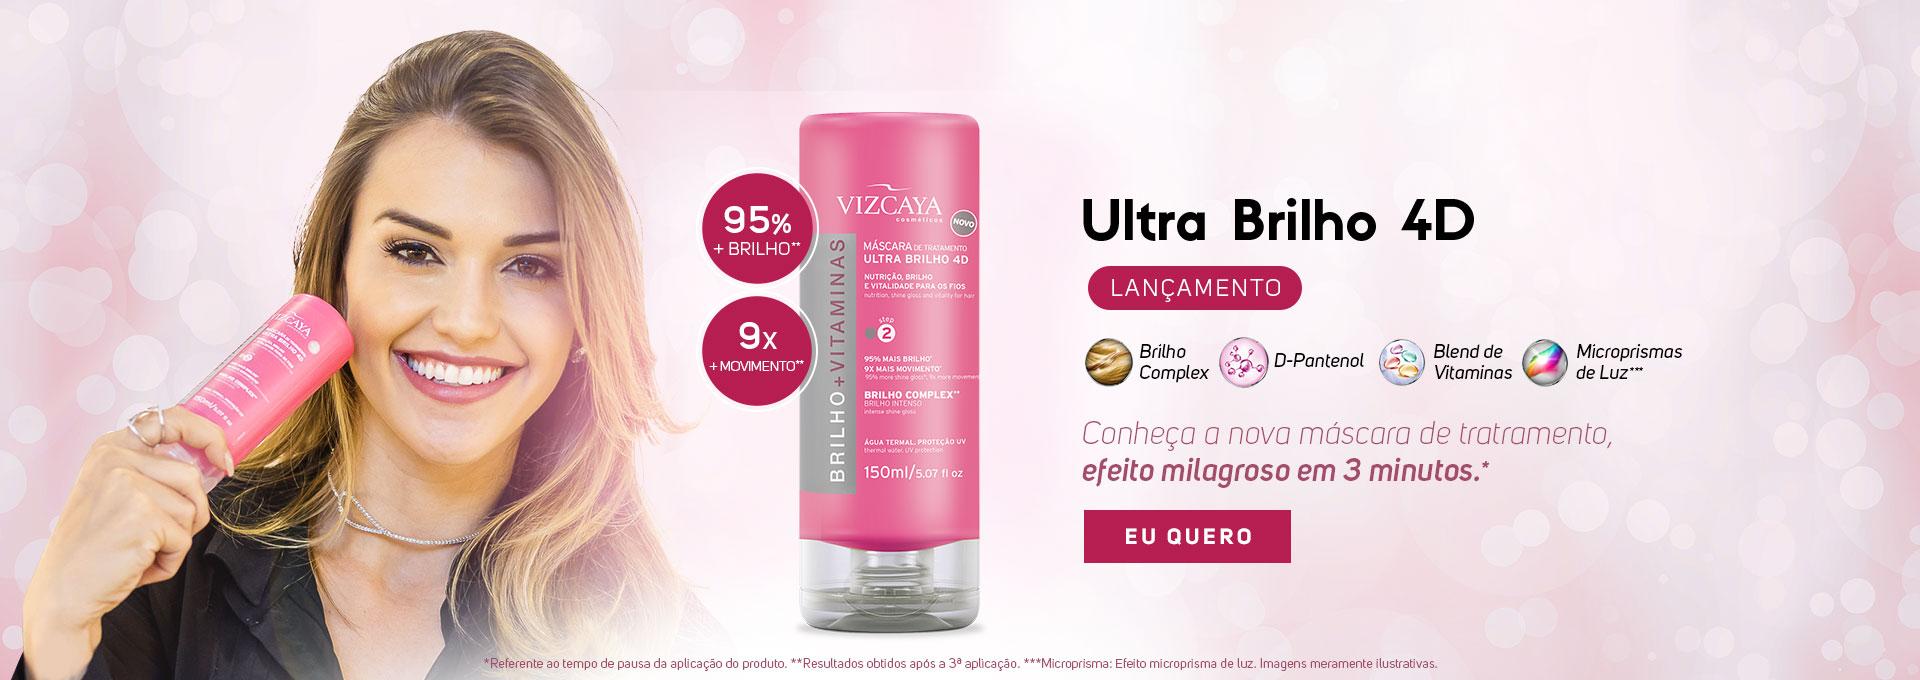 Brilho 4D